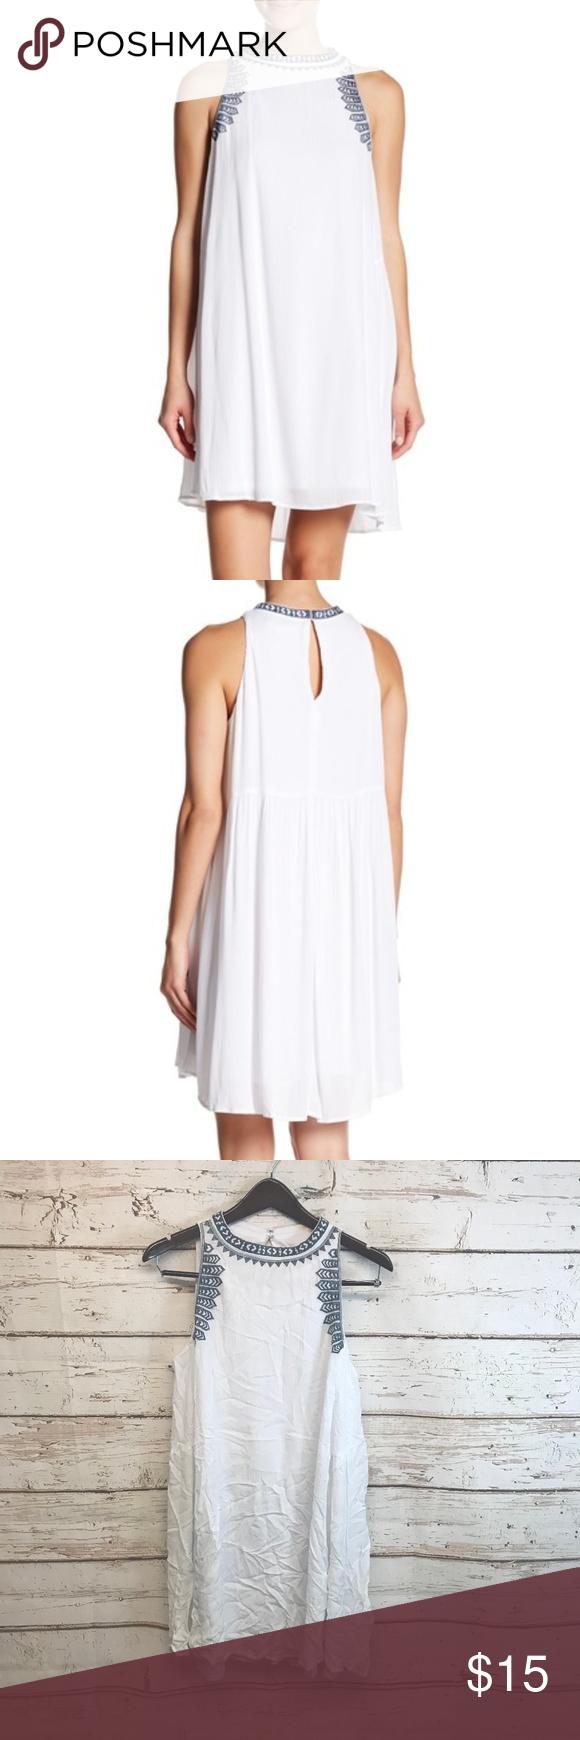 Hailey Lyn White Trim Trapeze Dress Medium Hailey Lyn New Womens Size Medium White Embroidered Trim Trapeze Dress 60 Crew N Trapeze Dress Dresses White Trim [ 1740 x 580 Pixel ]